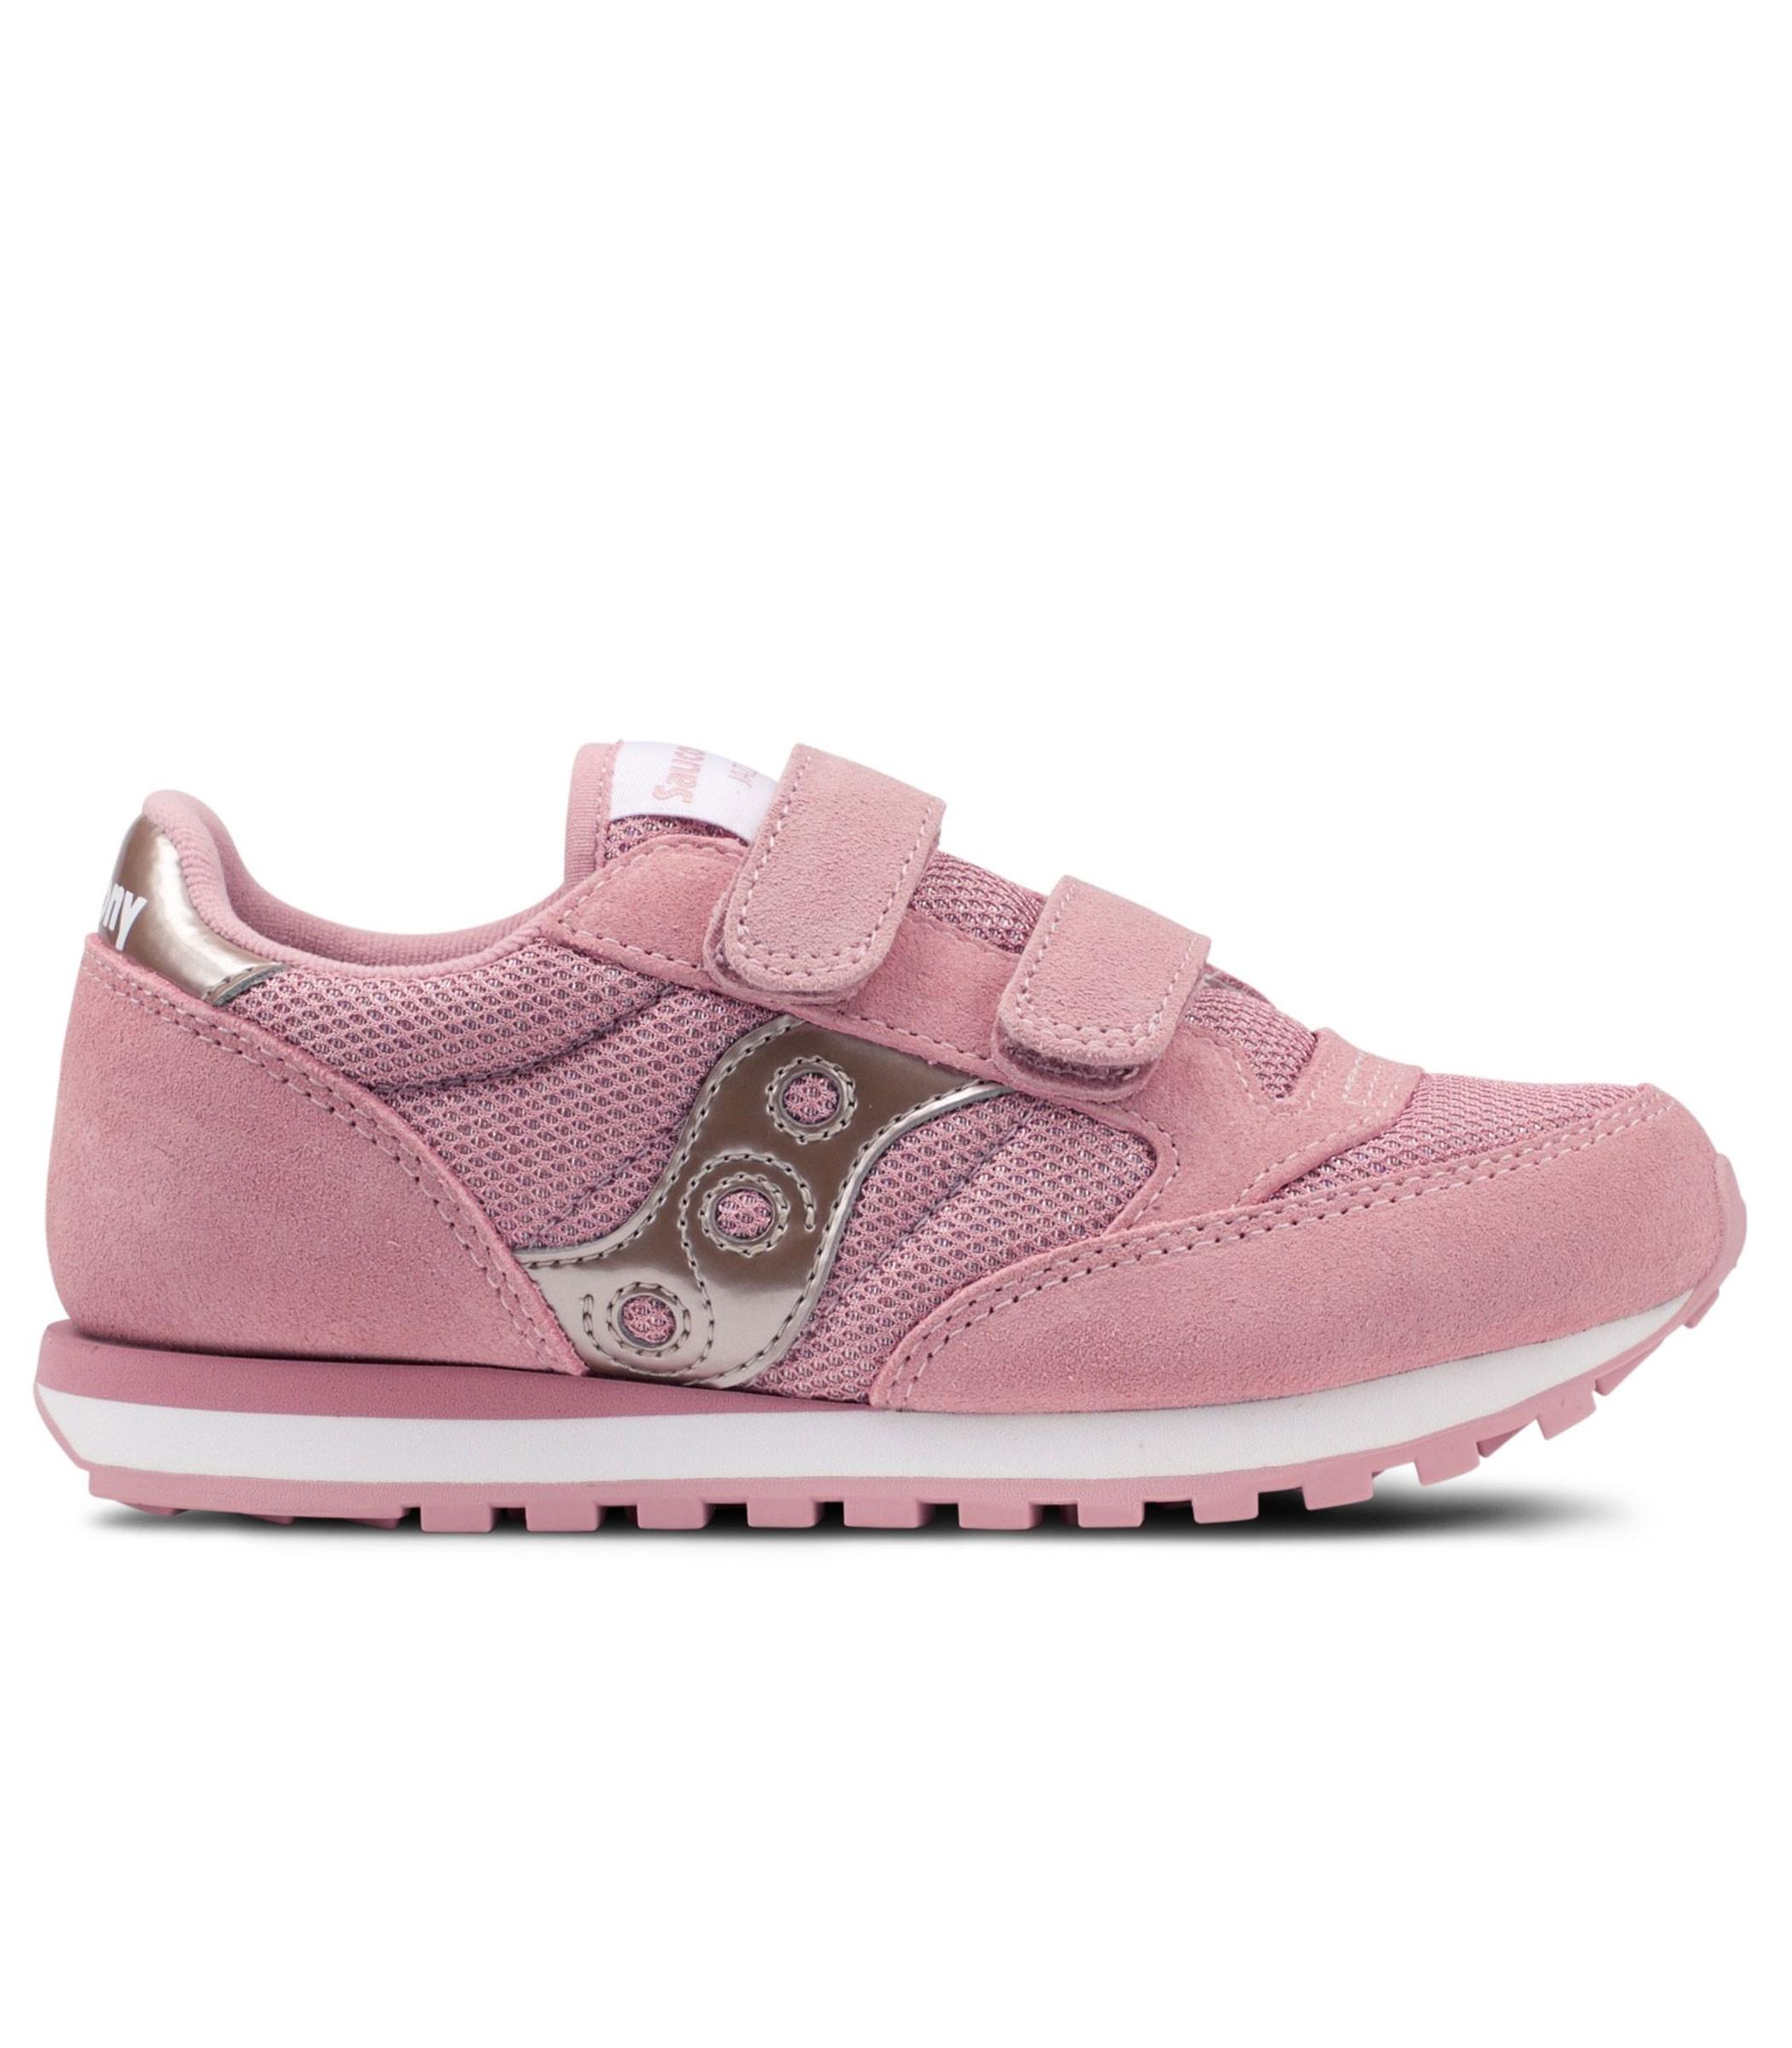 Scarpe Saucony Jazz Double HL Met Pink bimba Bambina Kids rif SK159625 07a3552da73